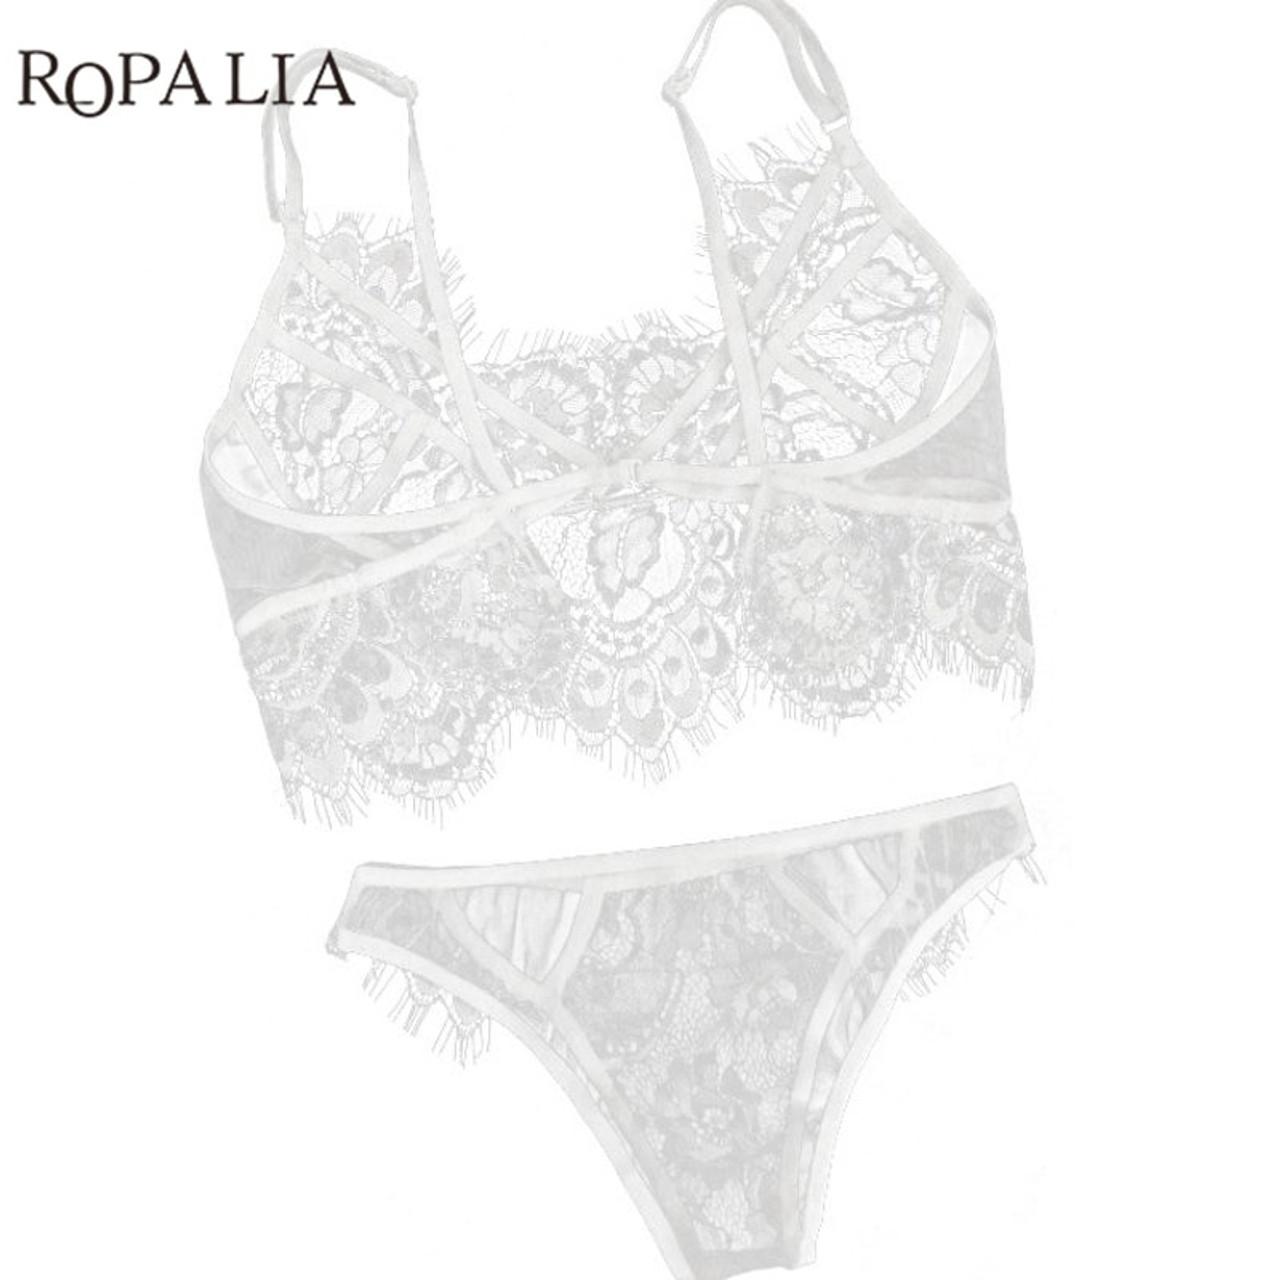 a457ac5717f8 ... Sexy Lace Bra Sets Bralette Soft Lingerie Push Up Bra Brief For Women  Deep V Cross